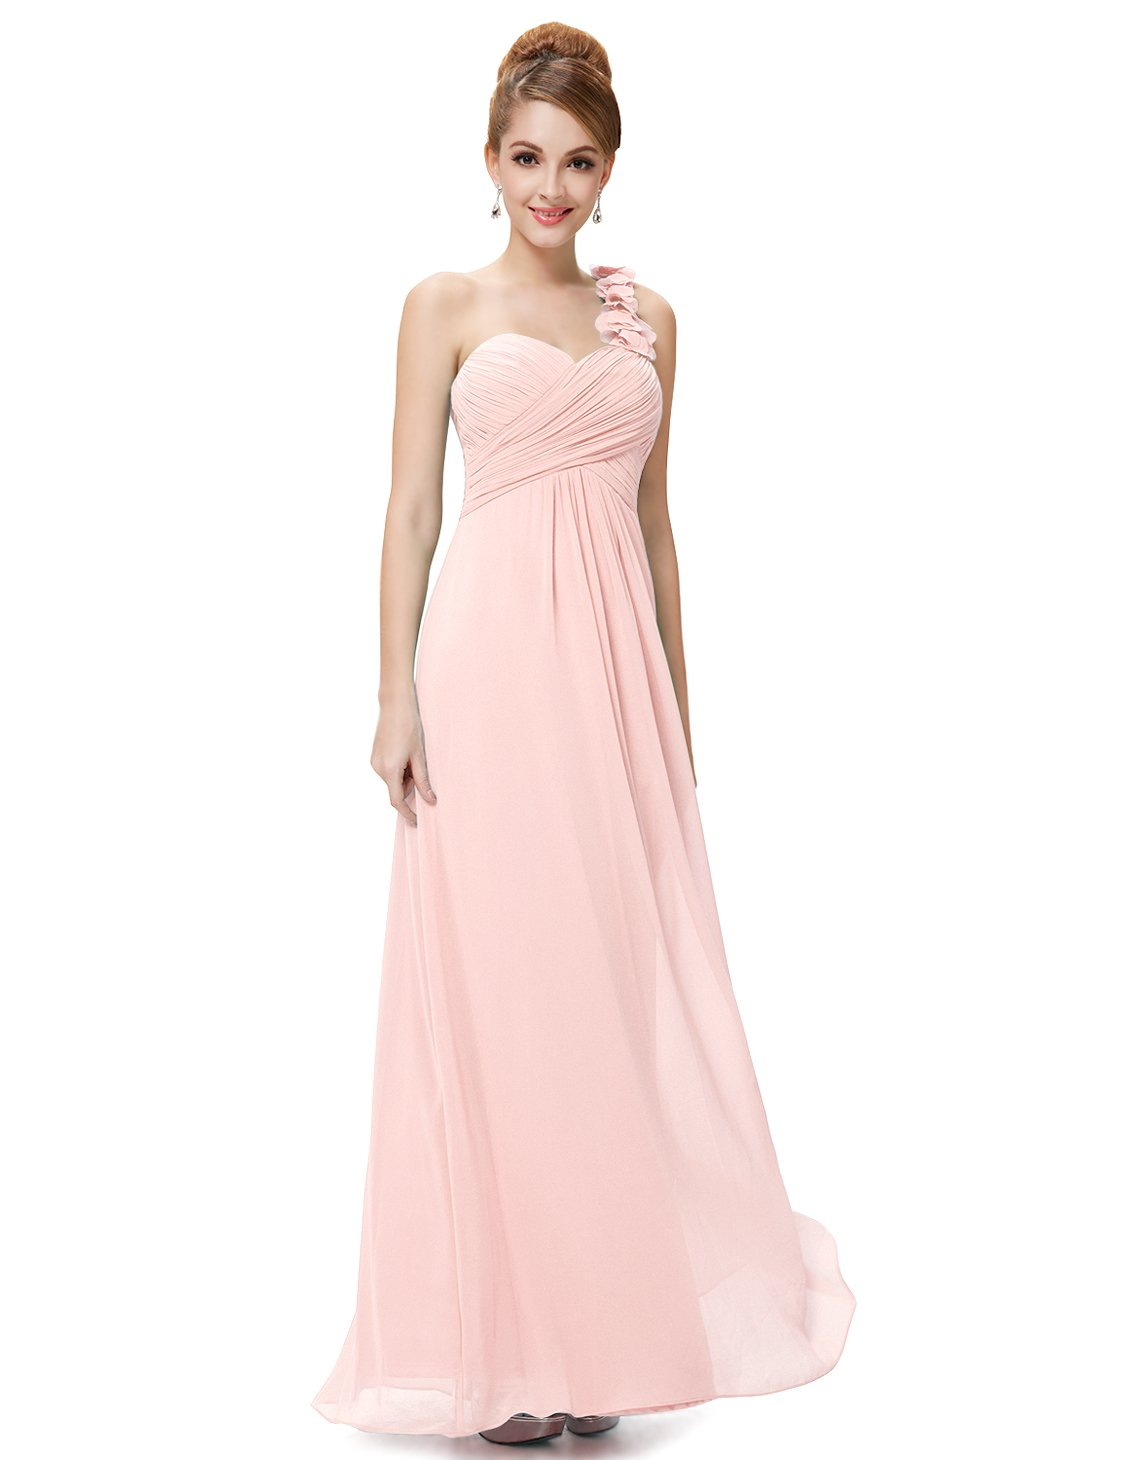 Ever-Pretty Womens Empire Waist Ruched Floor Length Bridesmaids Dress 4 US Pink